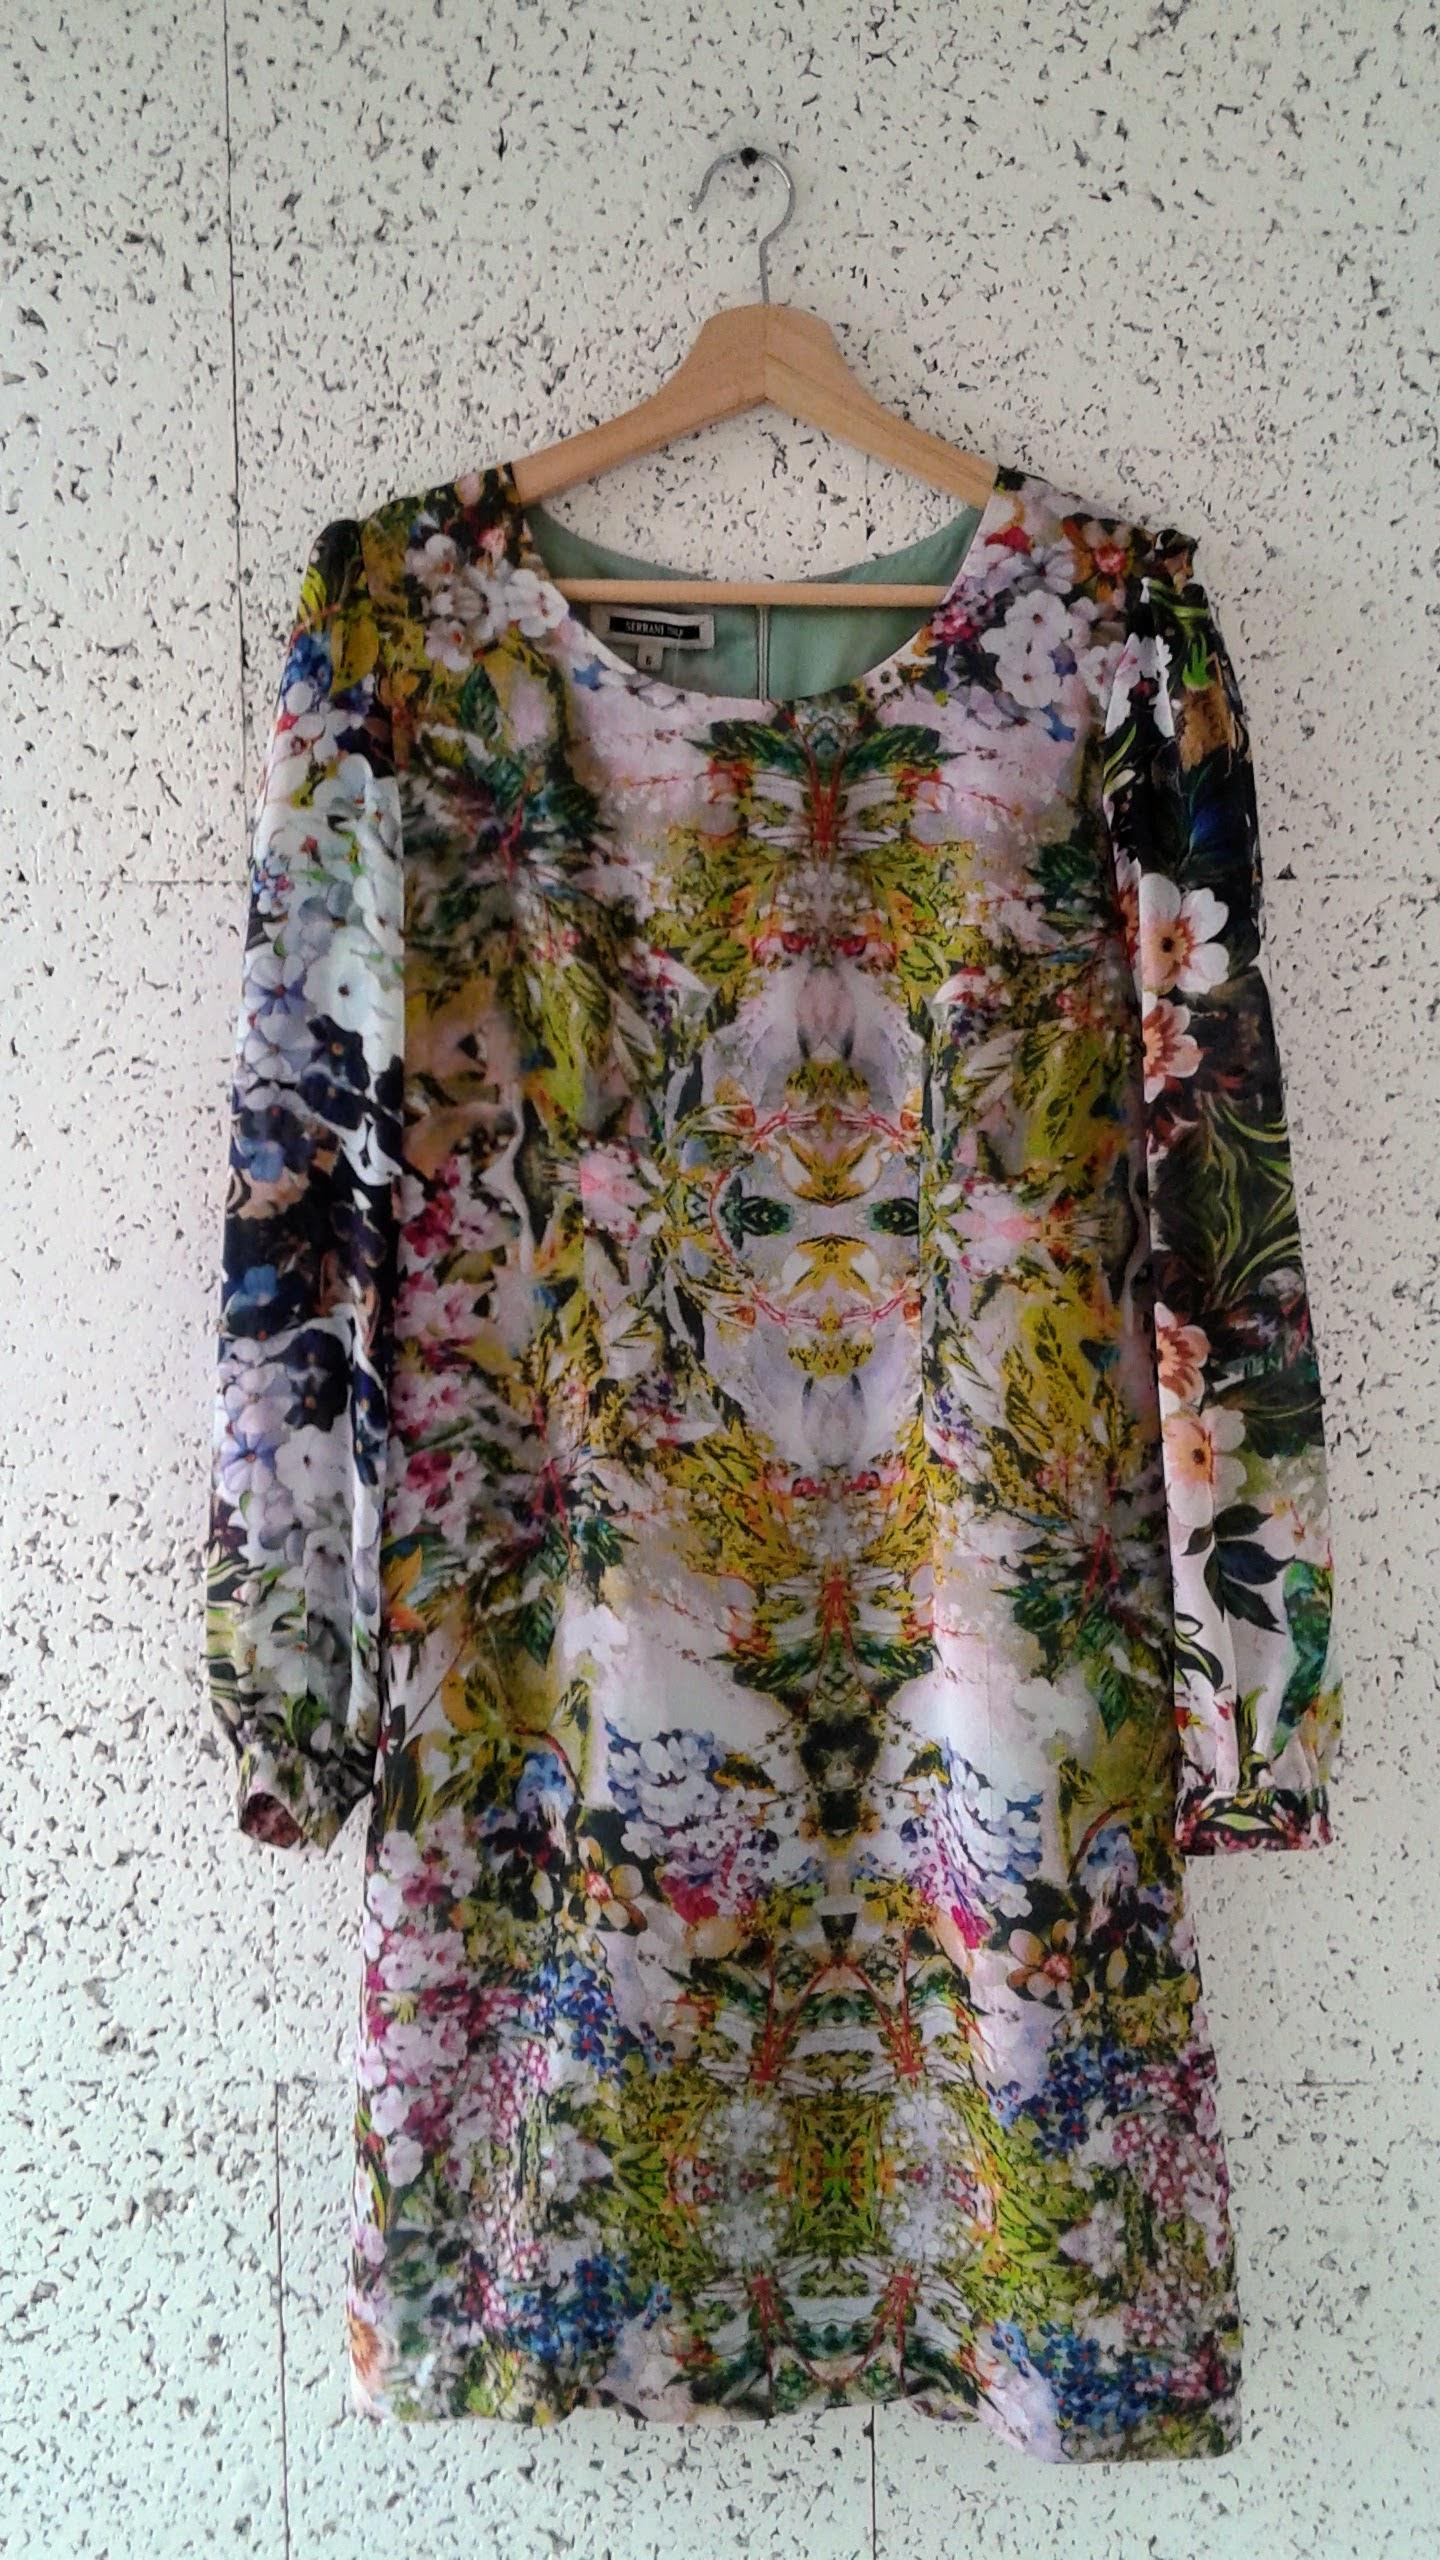 Serrani Italy dress; Size 6, $30